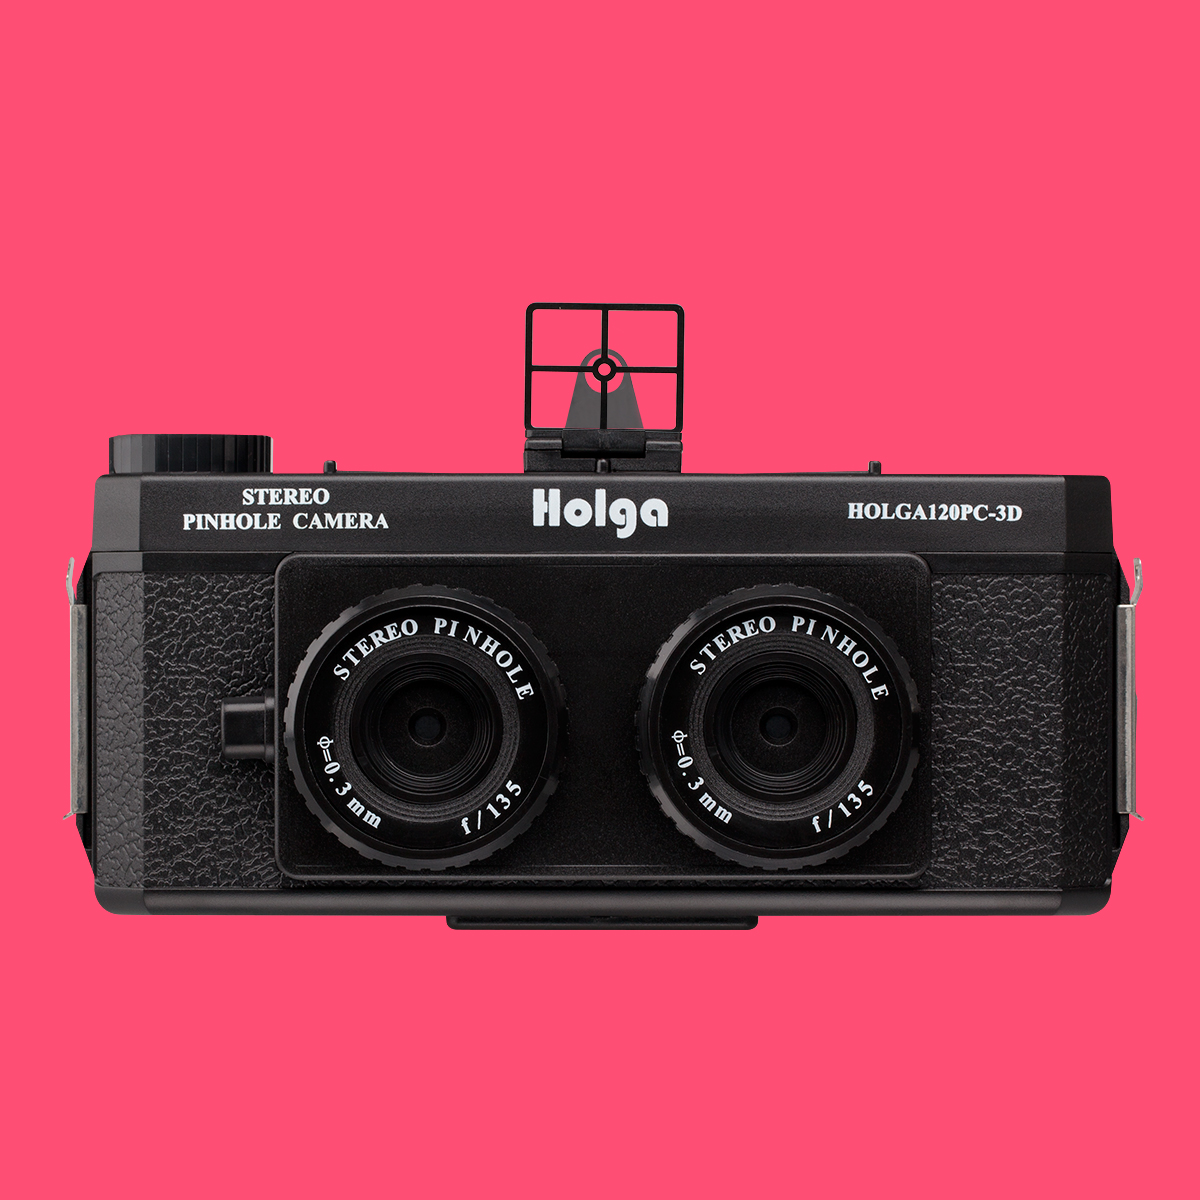 Holga Medium Format Camera - Microsite - Lomography